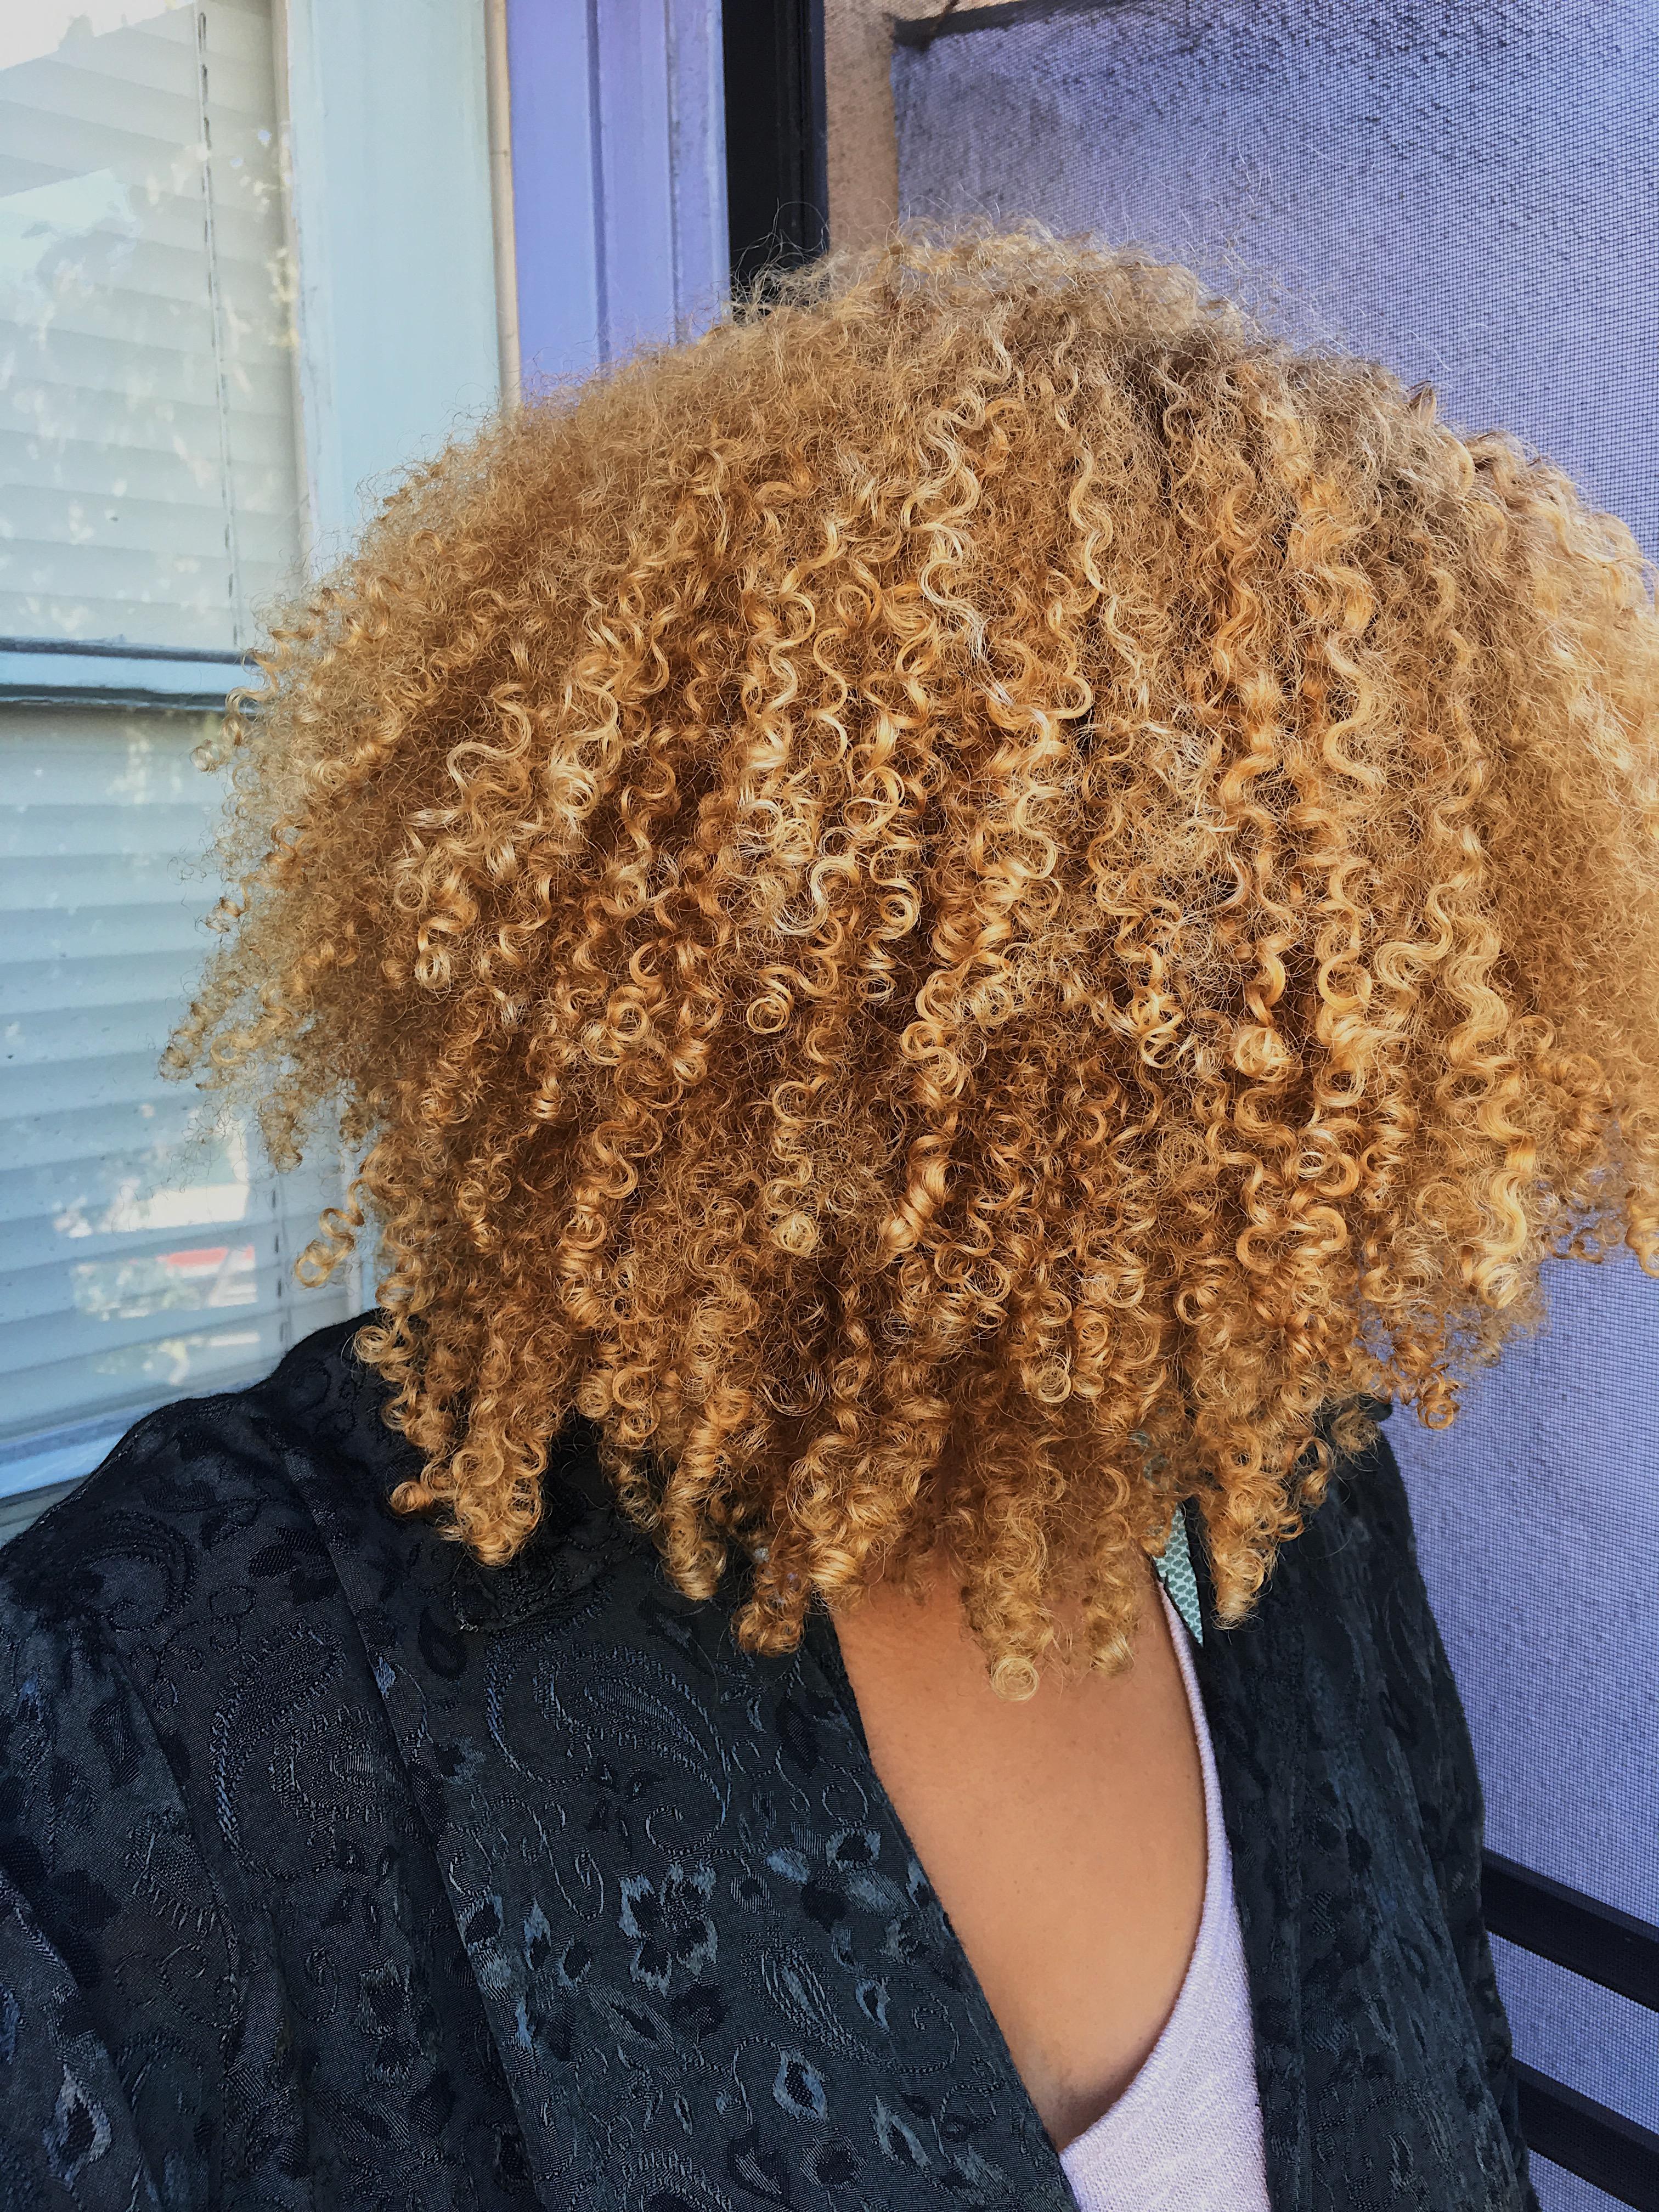 natural hair after using castor oil-blonde curls